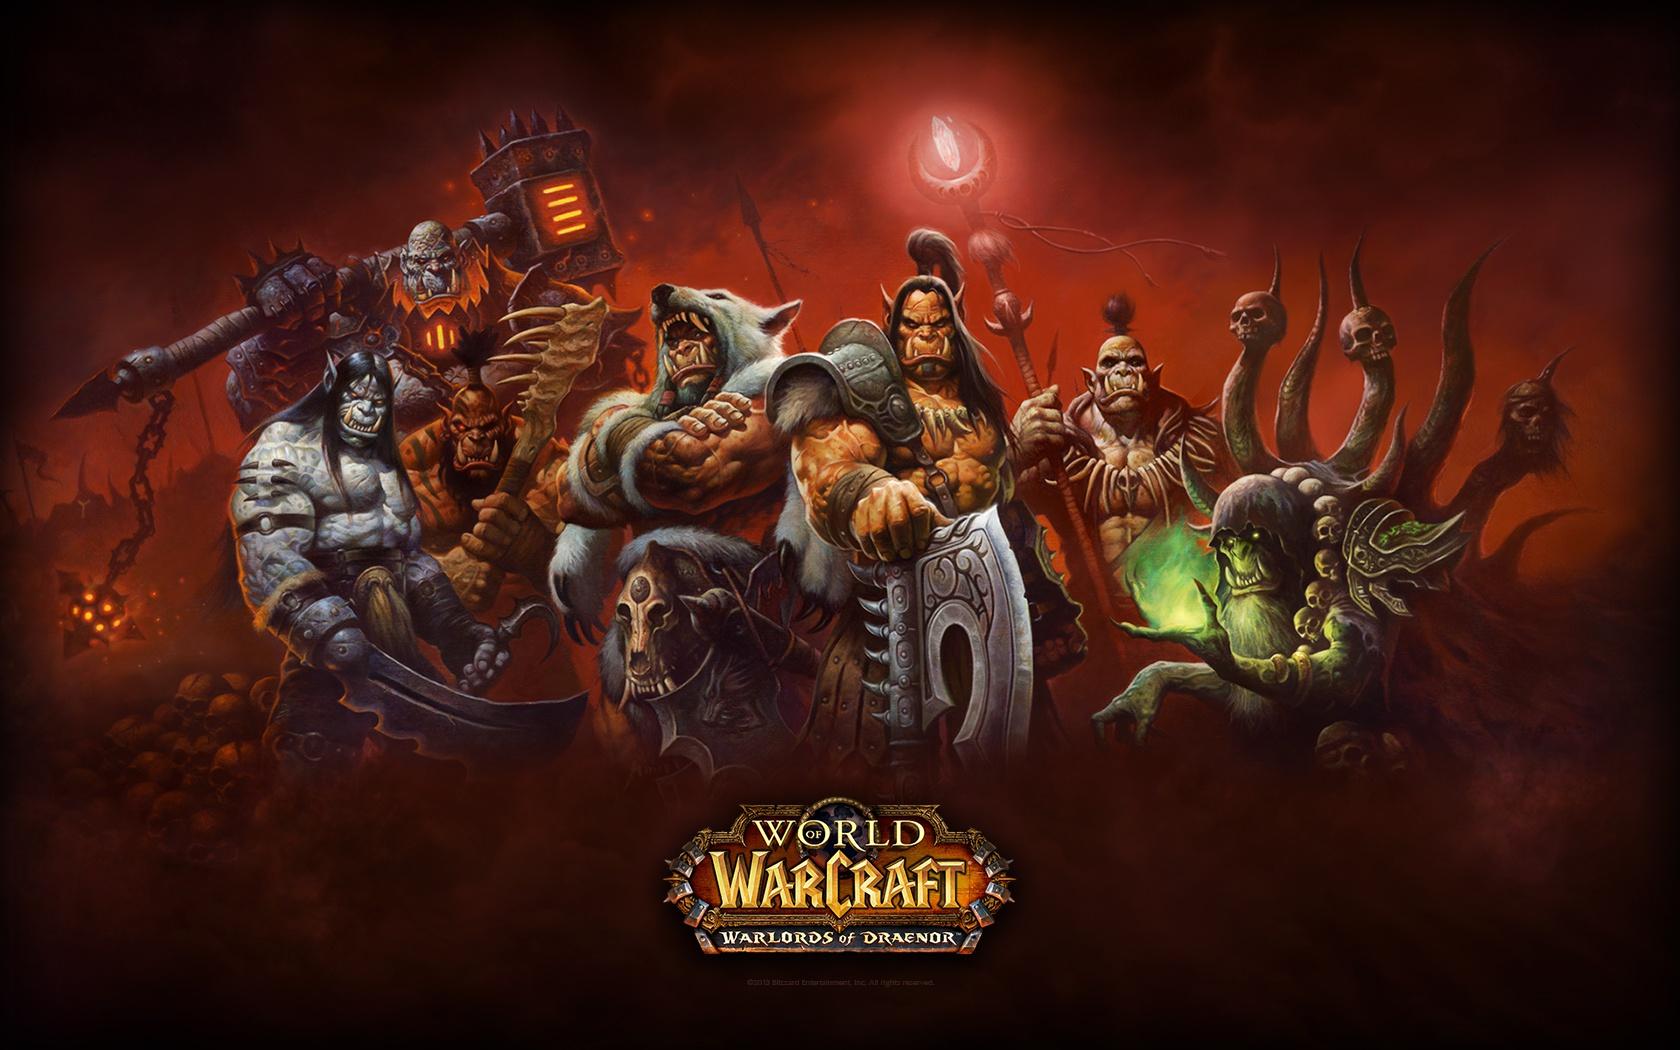 warlords-of-draenor-1680x1050_ur8w